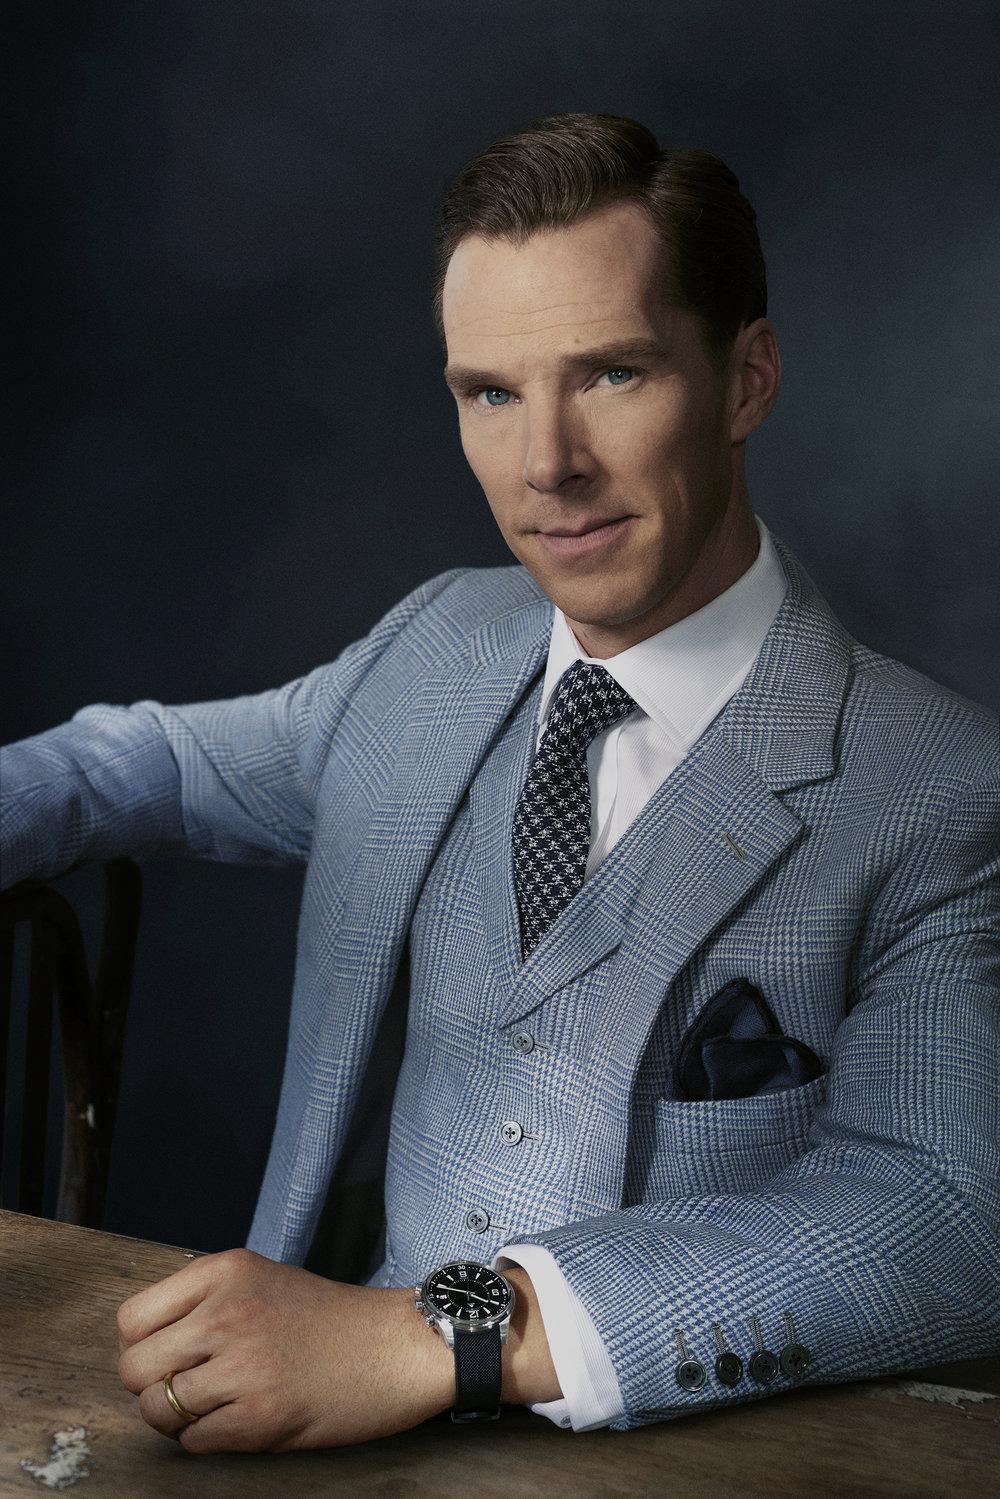 Benedict 721_V03 low res.jpg